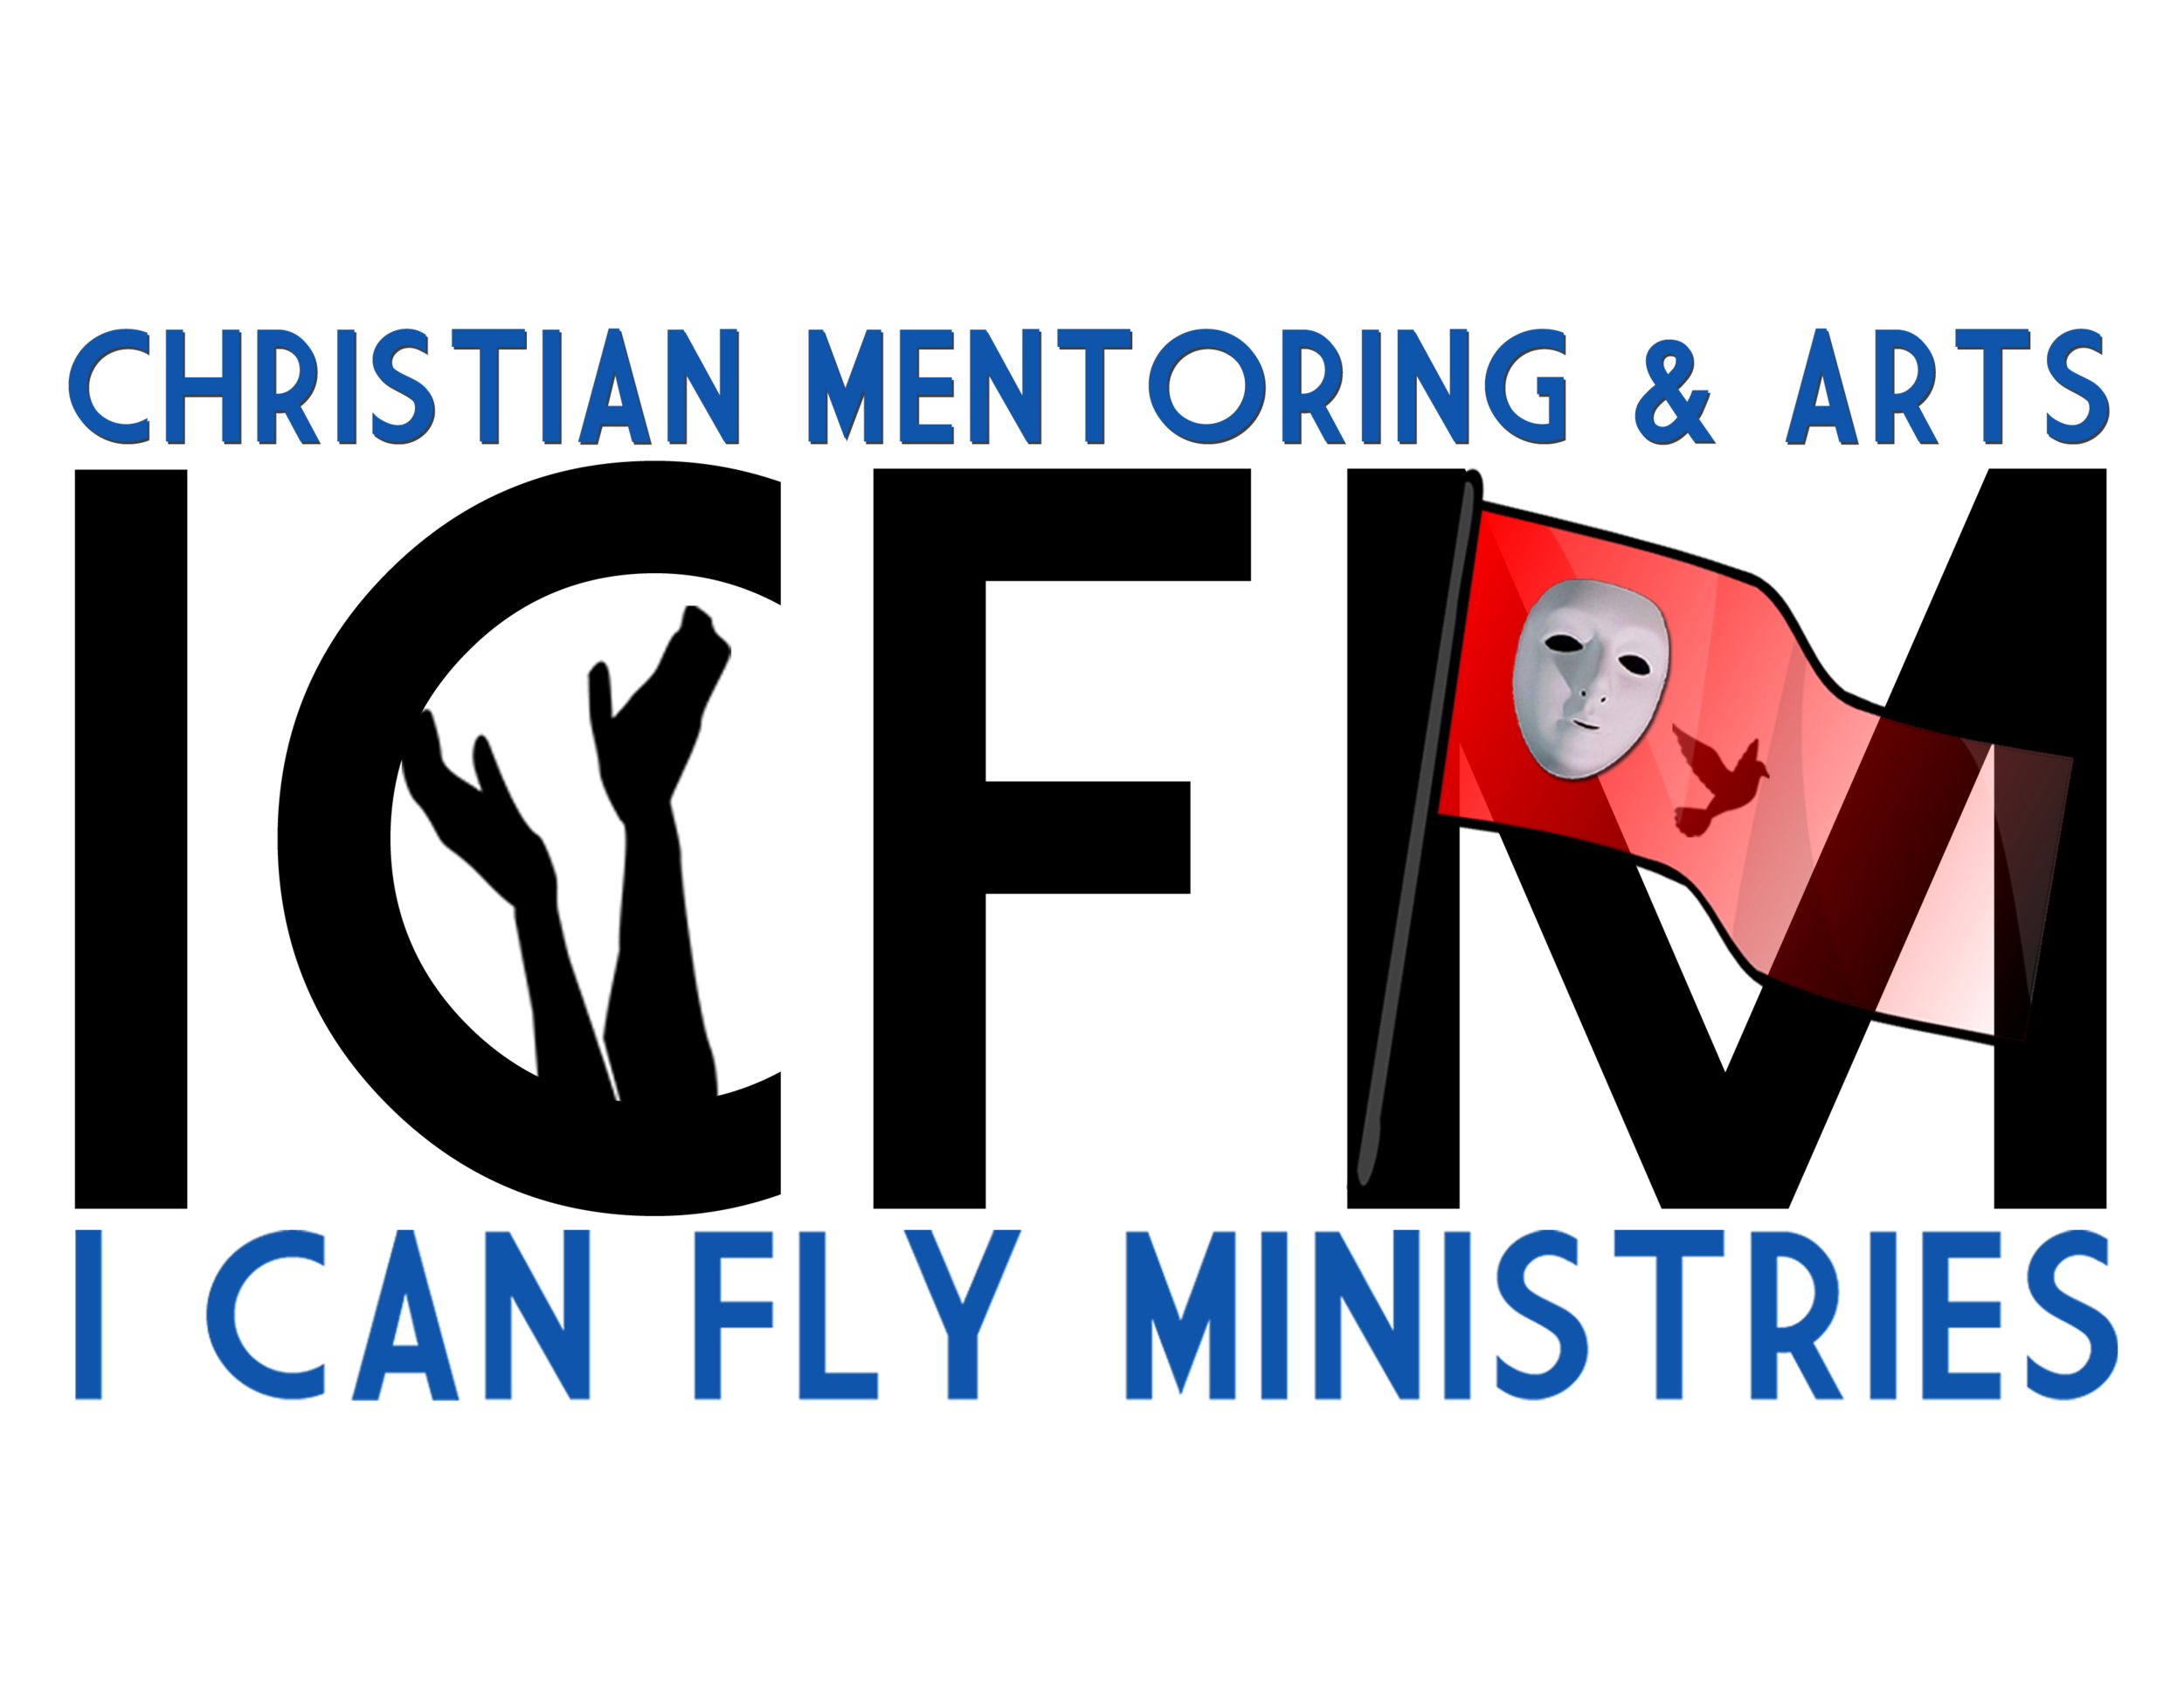 ICFM_2015_Logo.png